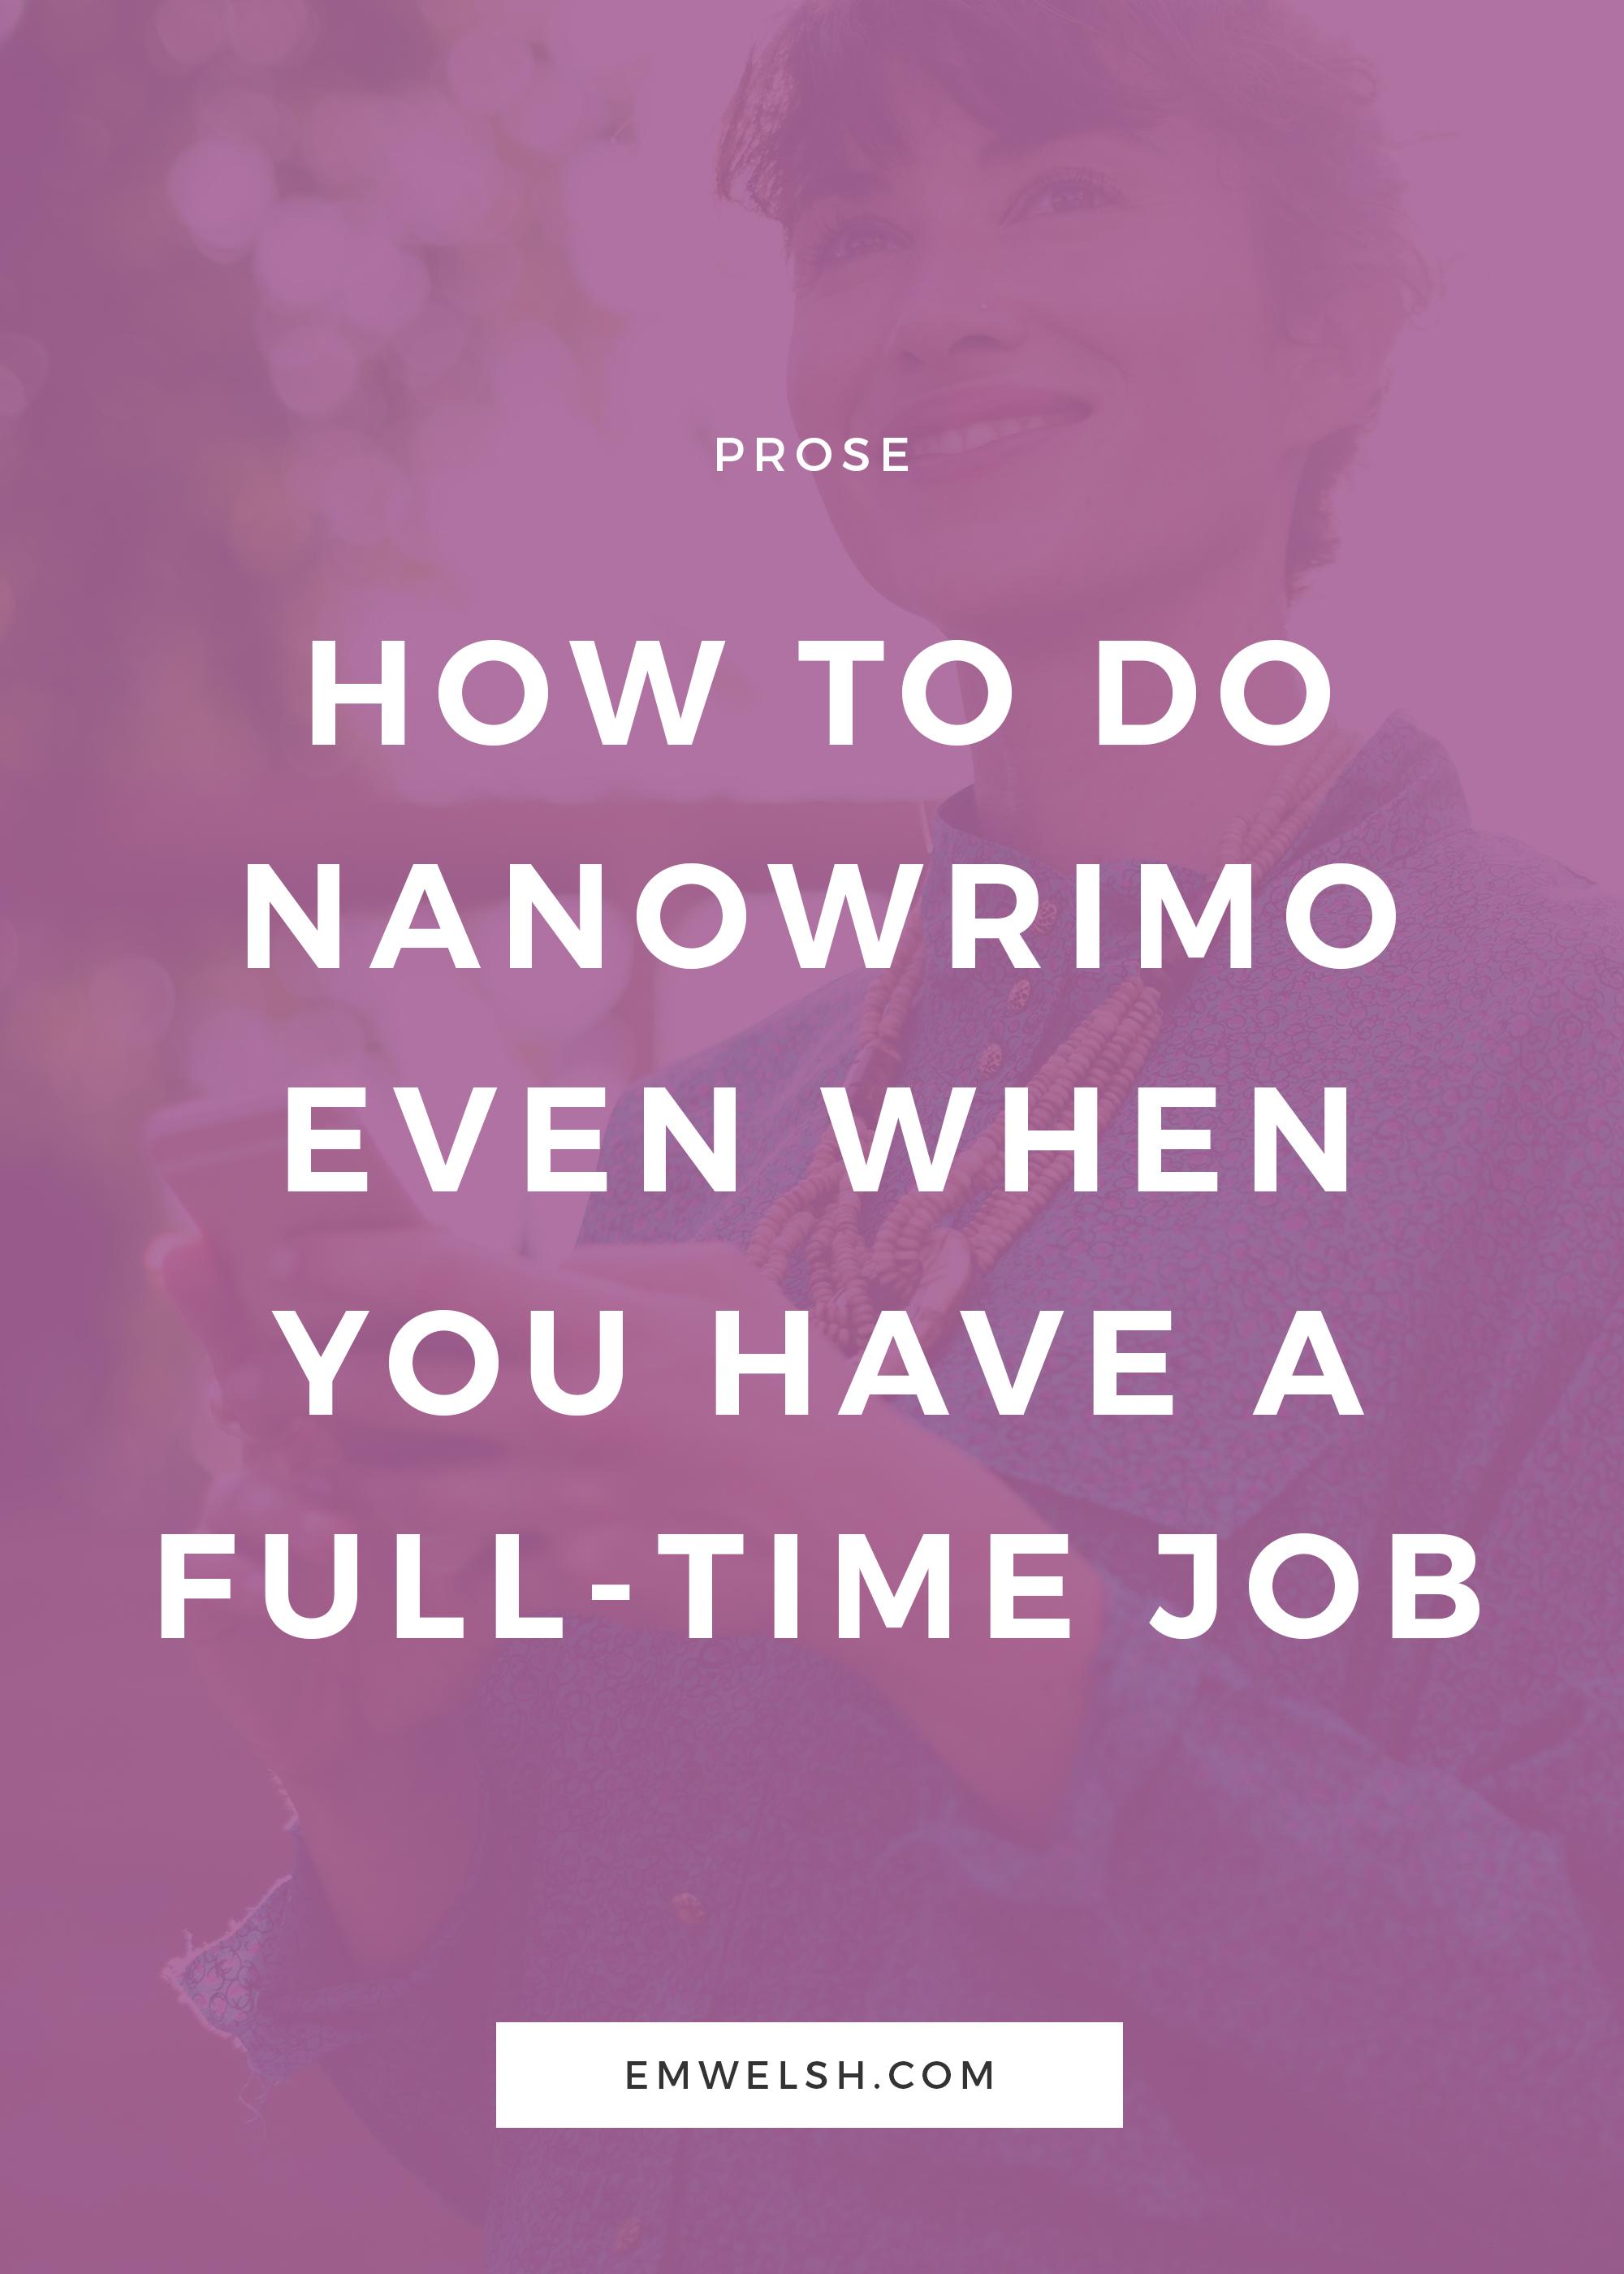 nanowrimo-full-time-job.jpg